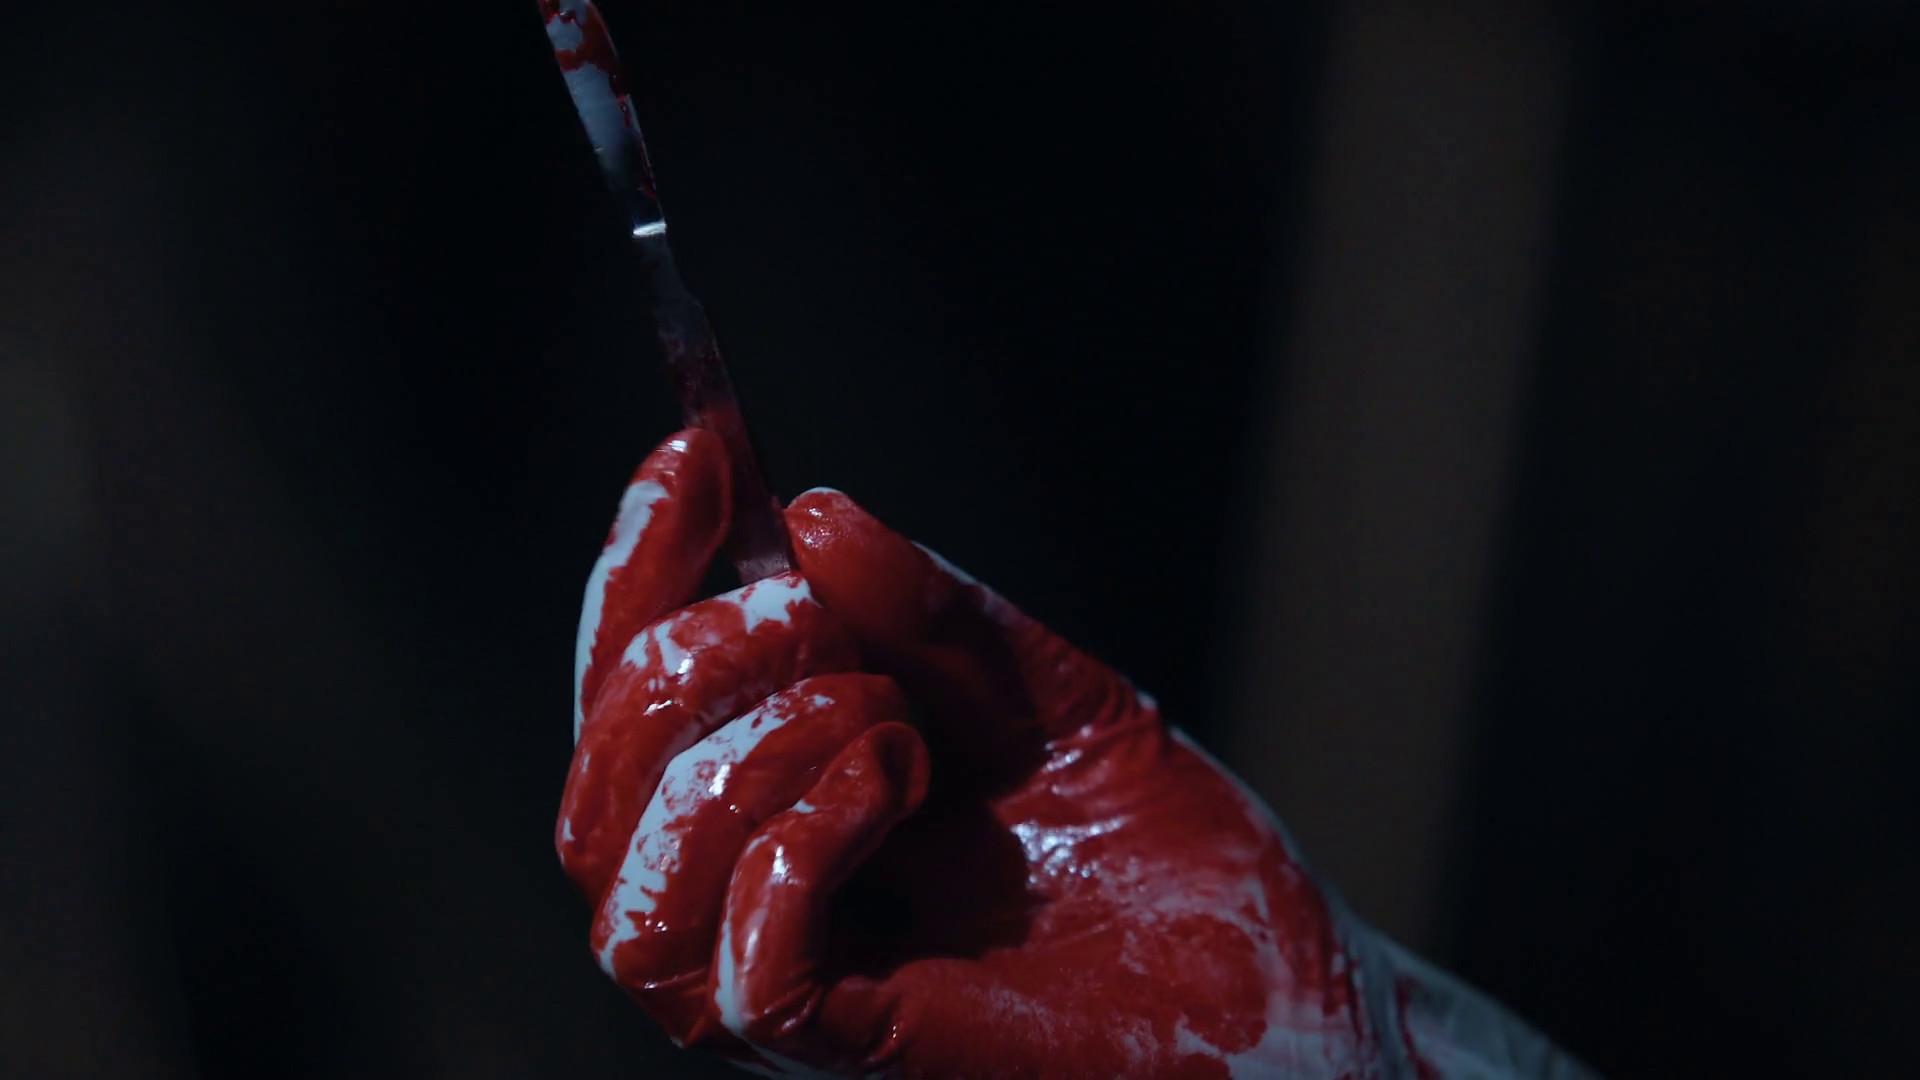 Bloody scalpel in hands of cruel serial killer, violence and crime, horror  scene Stock Video Footage – VideoBlocks